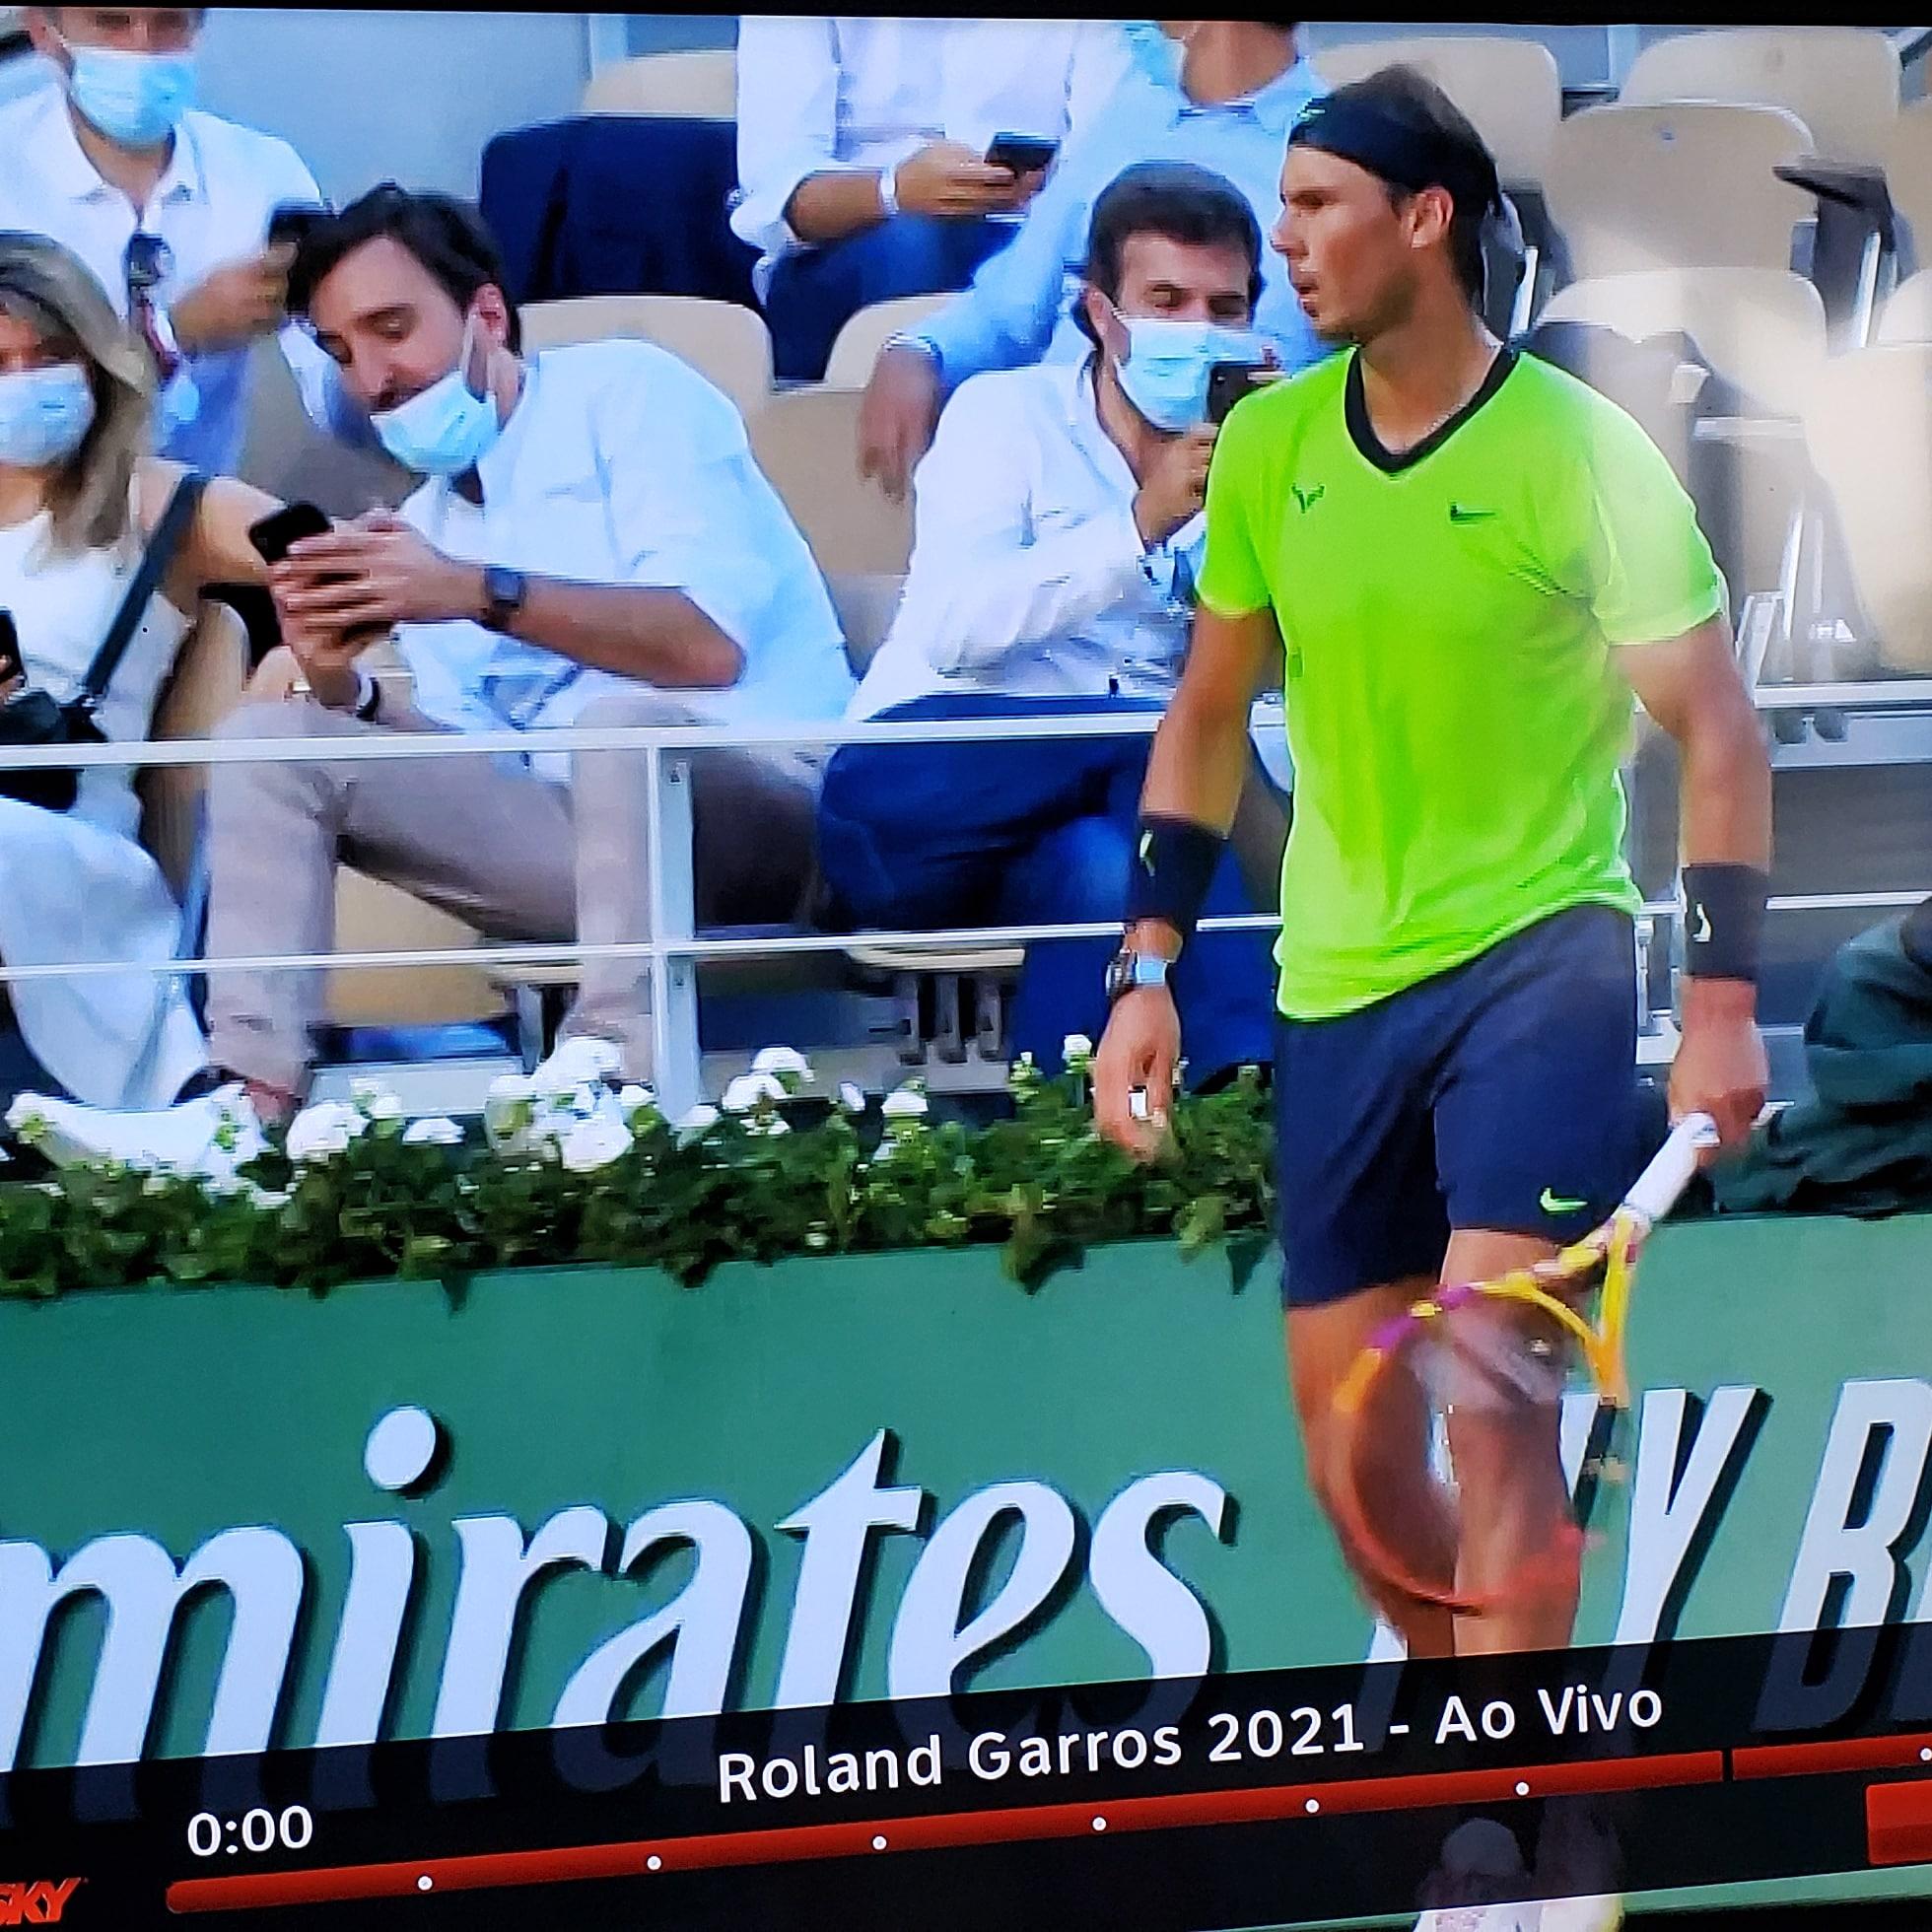 #RolandGarrosNoSportTV Foto,#RolandGarrosNoSportTV Tendências Do Twitter - Top Tweets